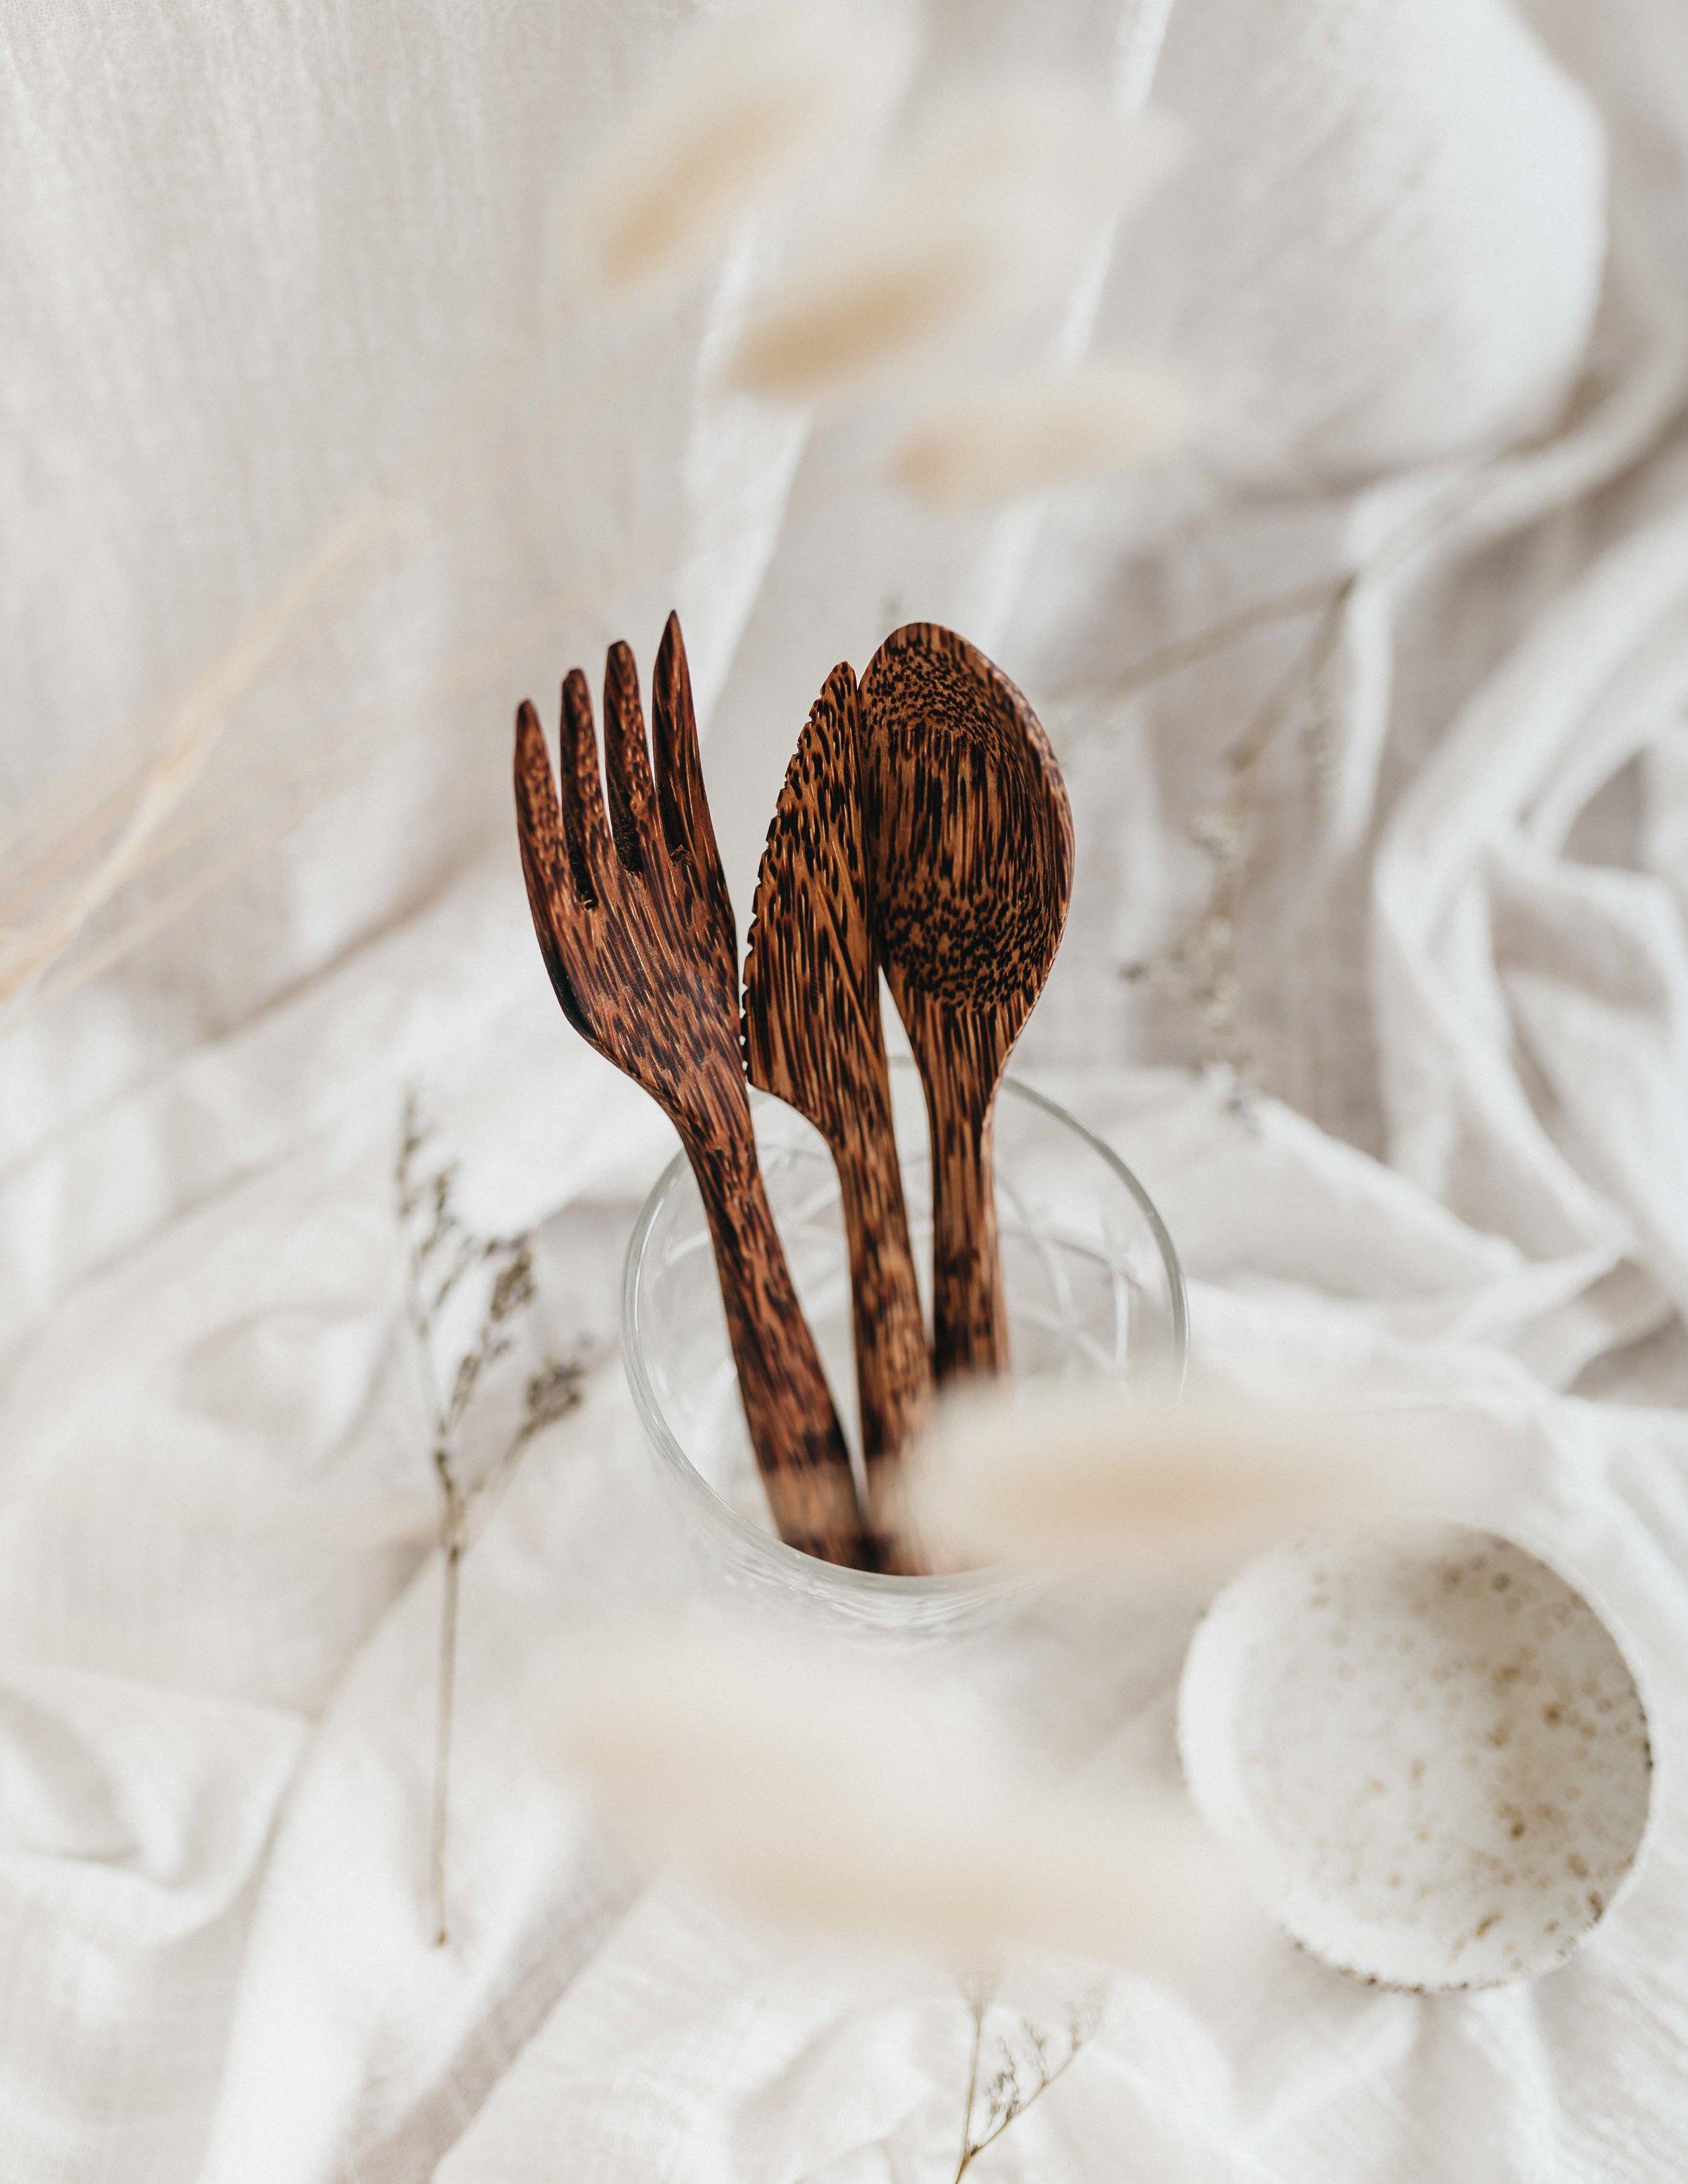 keira-mason-nowhere-and-everywhere-cutlery.jpg